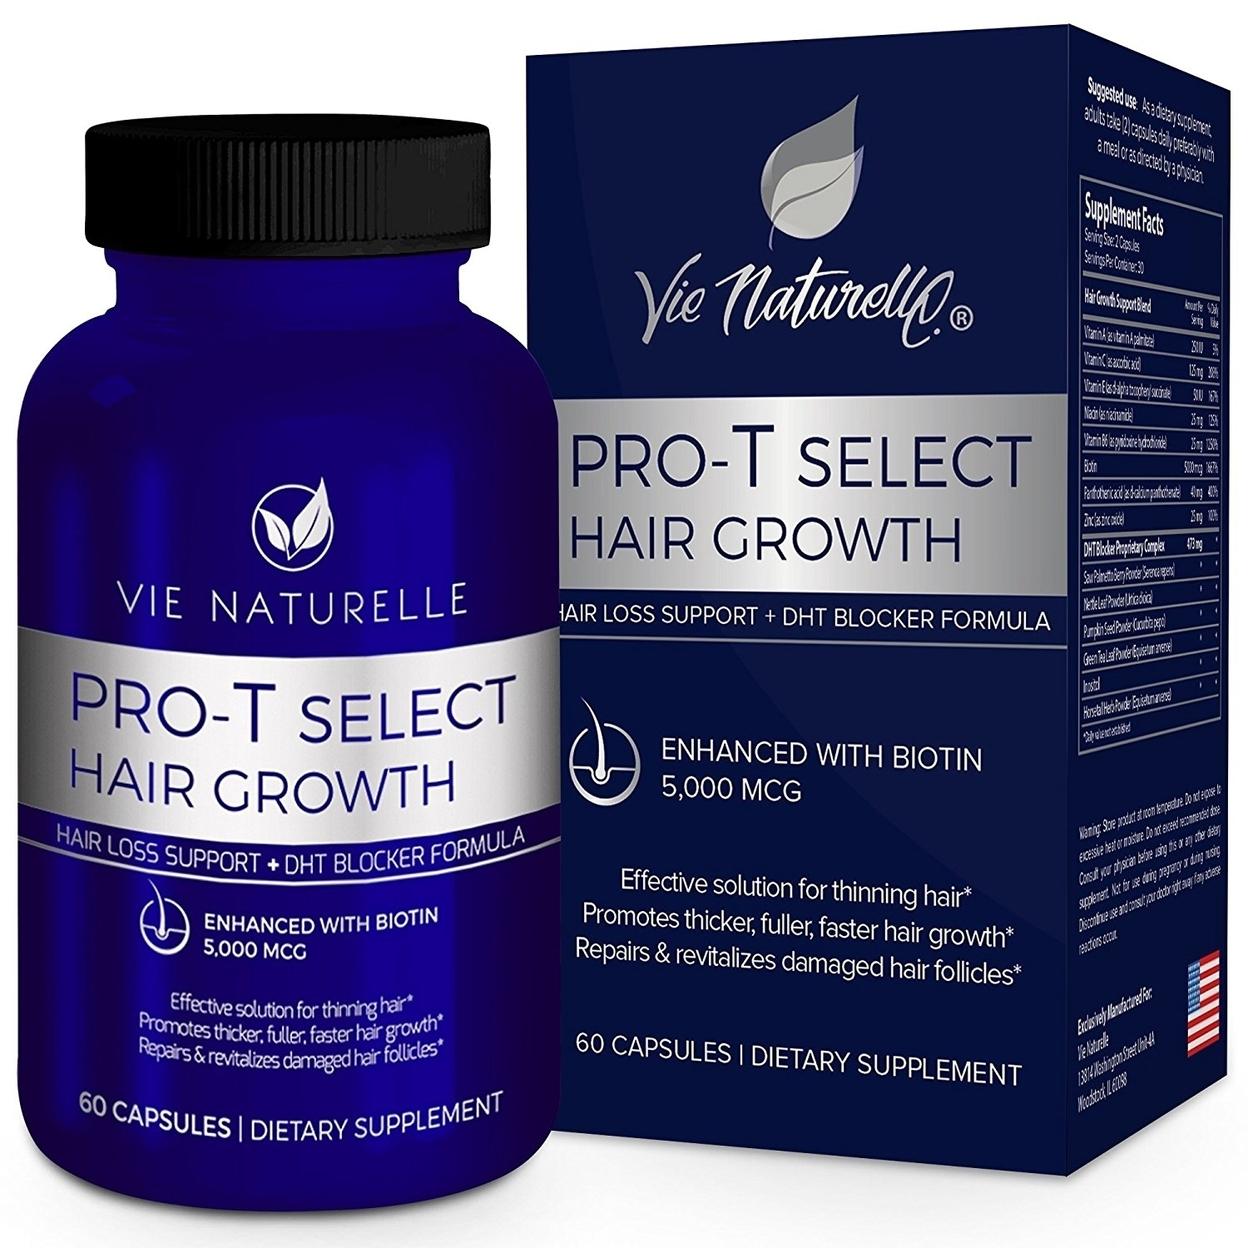 Vie Naturelle Hair Loss Vitamins + DHT Blocker Supplement 58f7956cc98fc462b30d9f4f